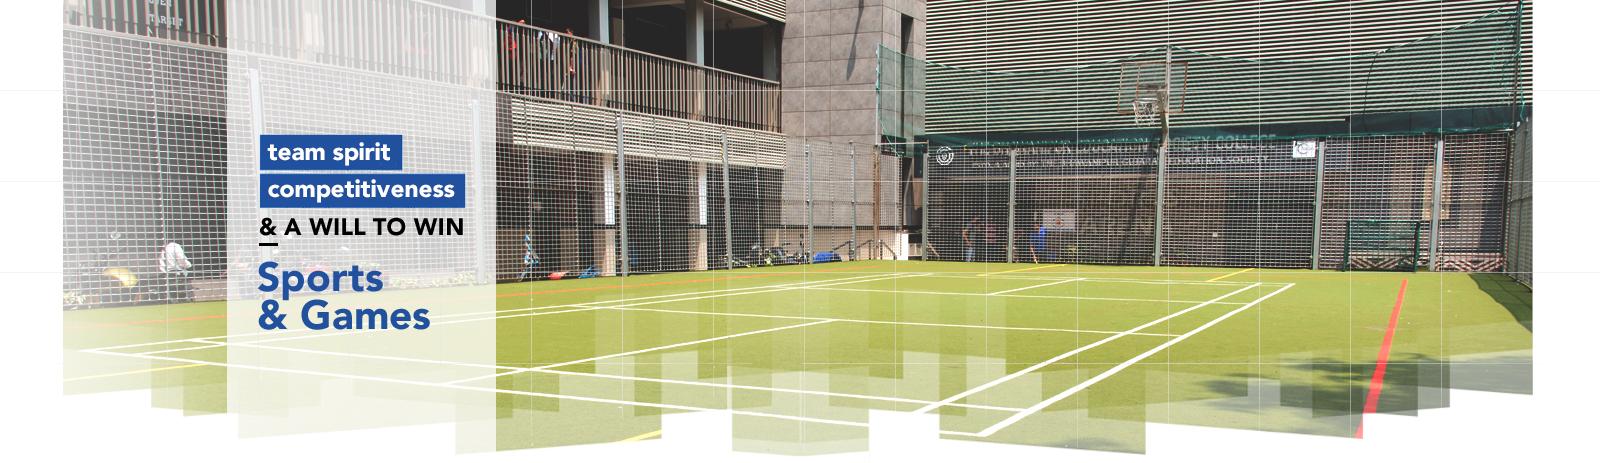 sports-slide1